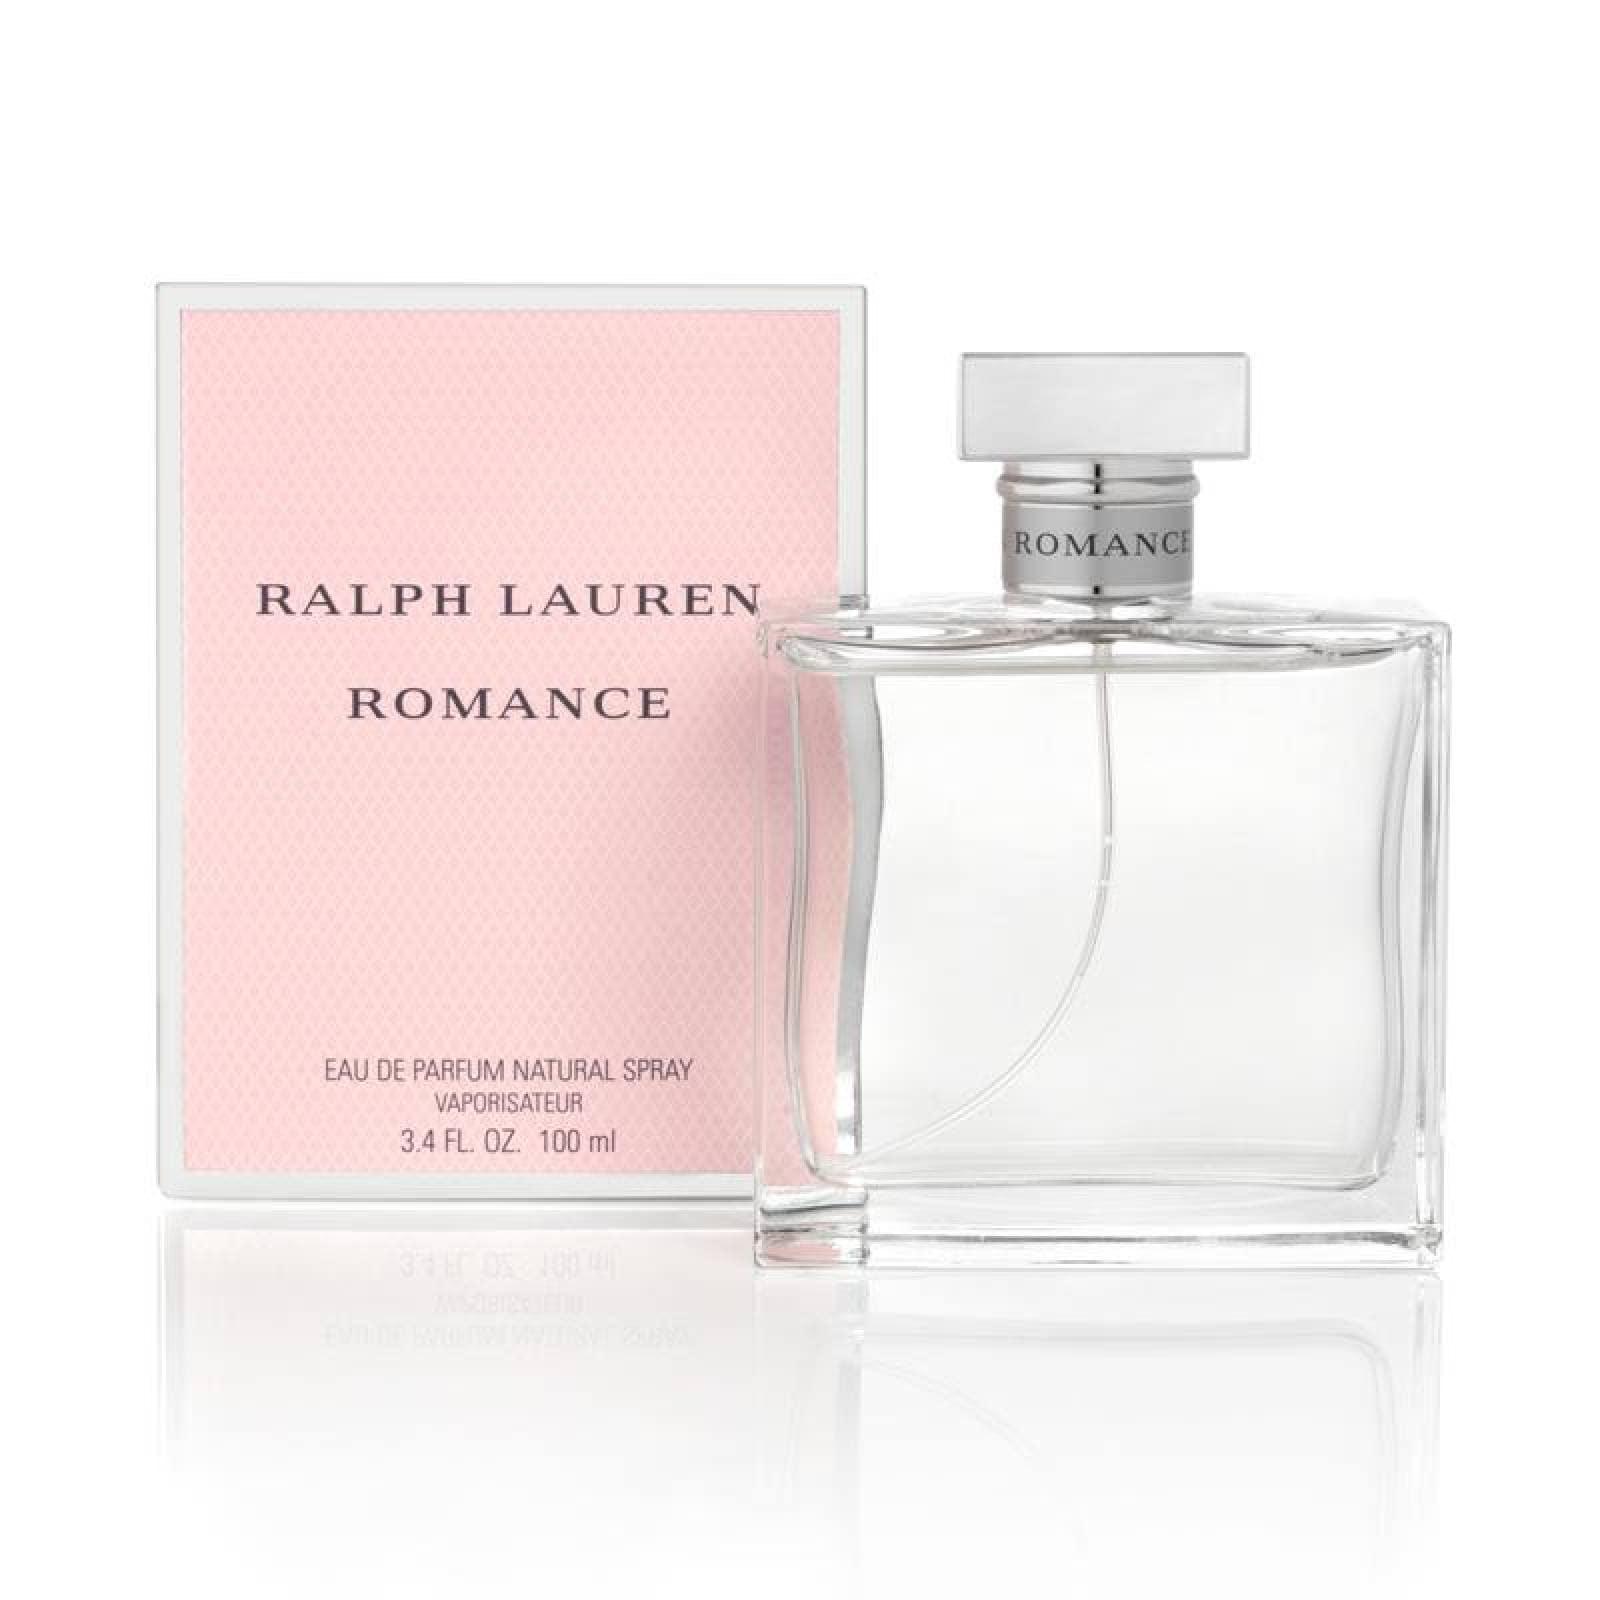 Romance de Ralph Lauren Eau de Parfum 100 ml. Fragancia para Dama